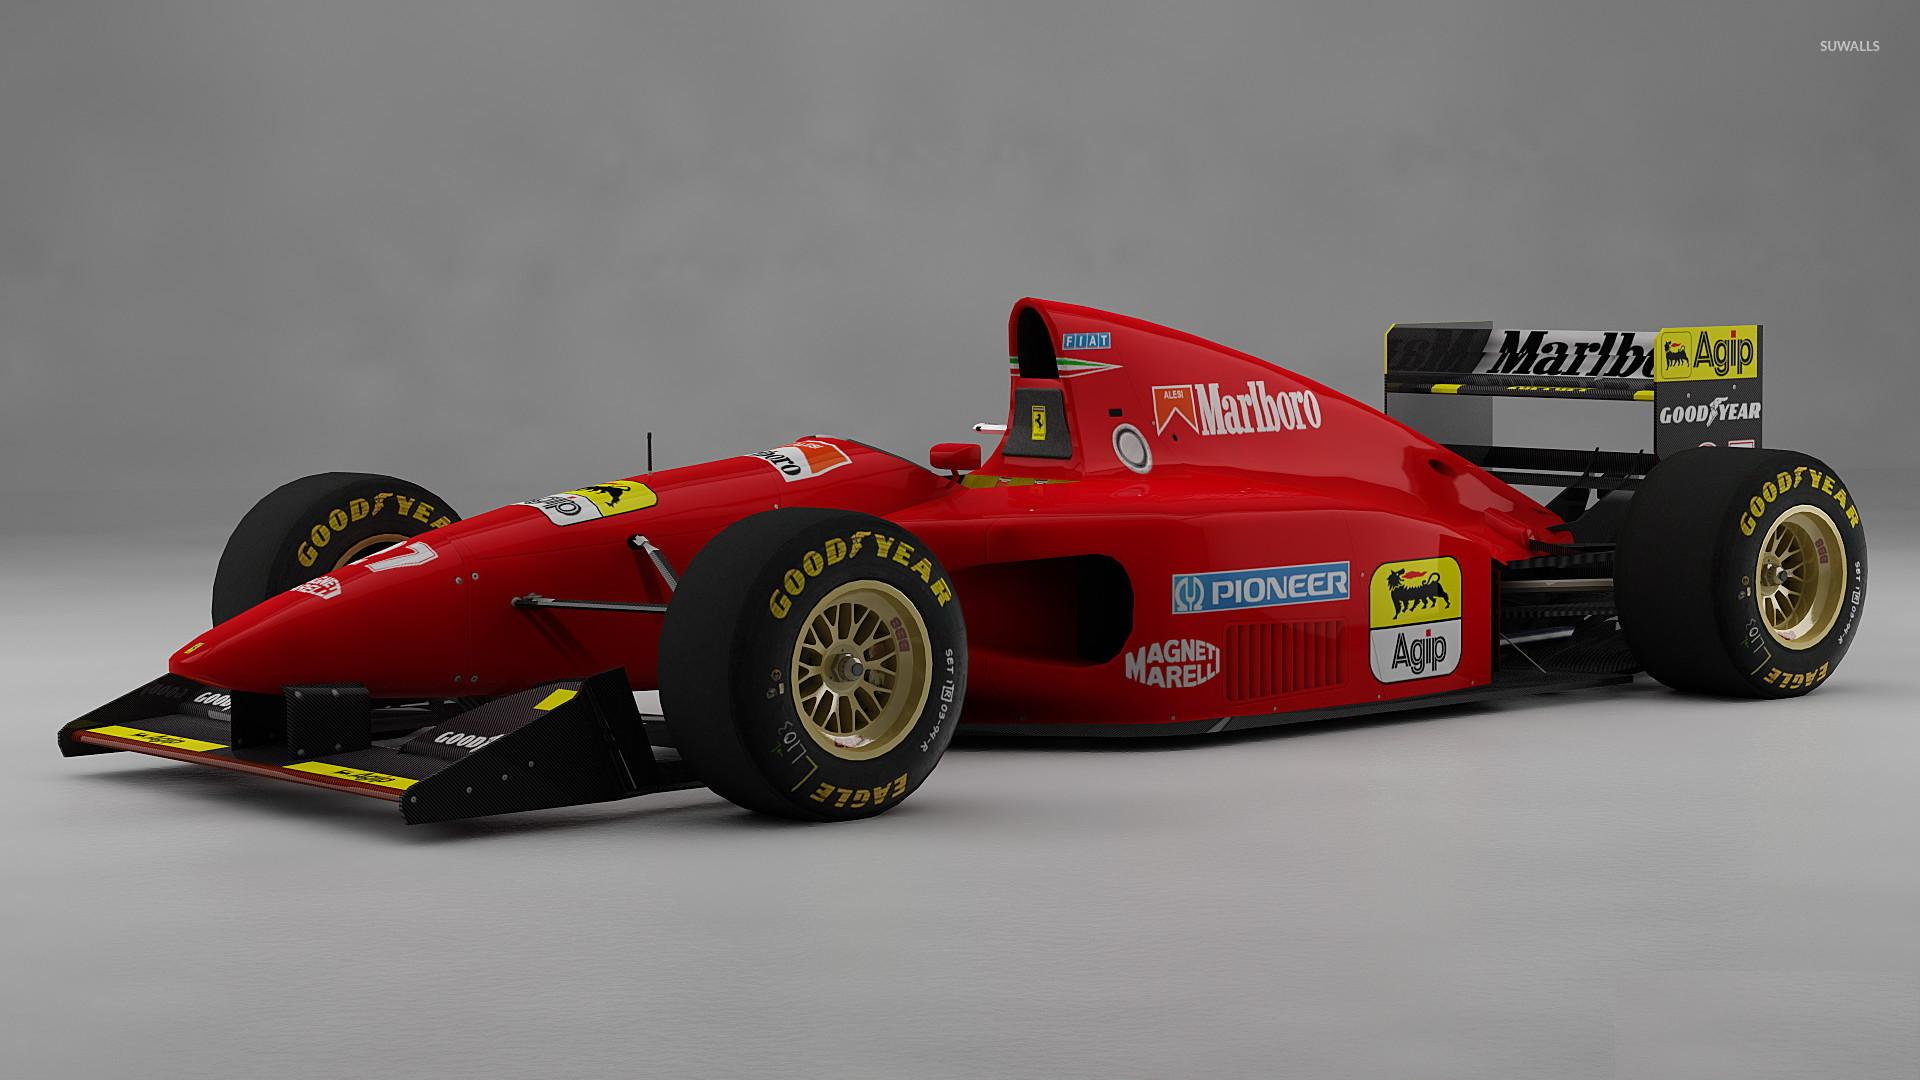 Ferrari 412t Wallpaper Sport Wallpapers 30613